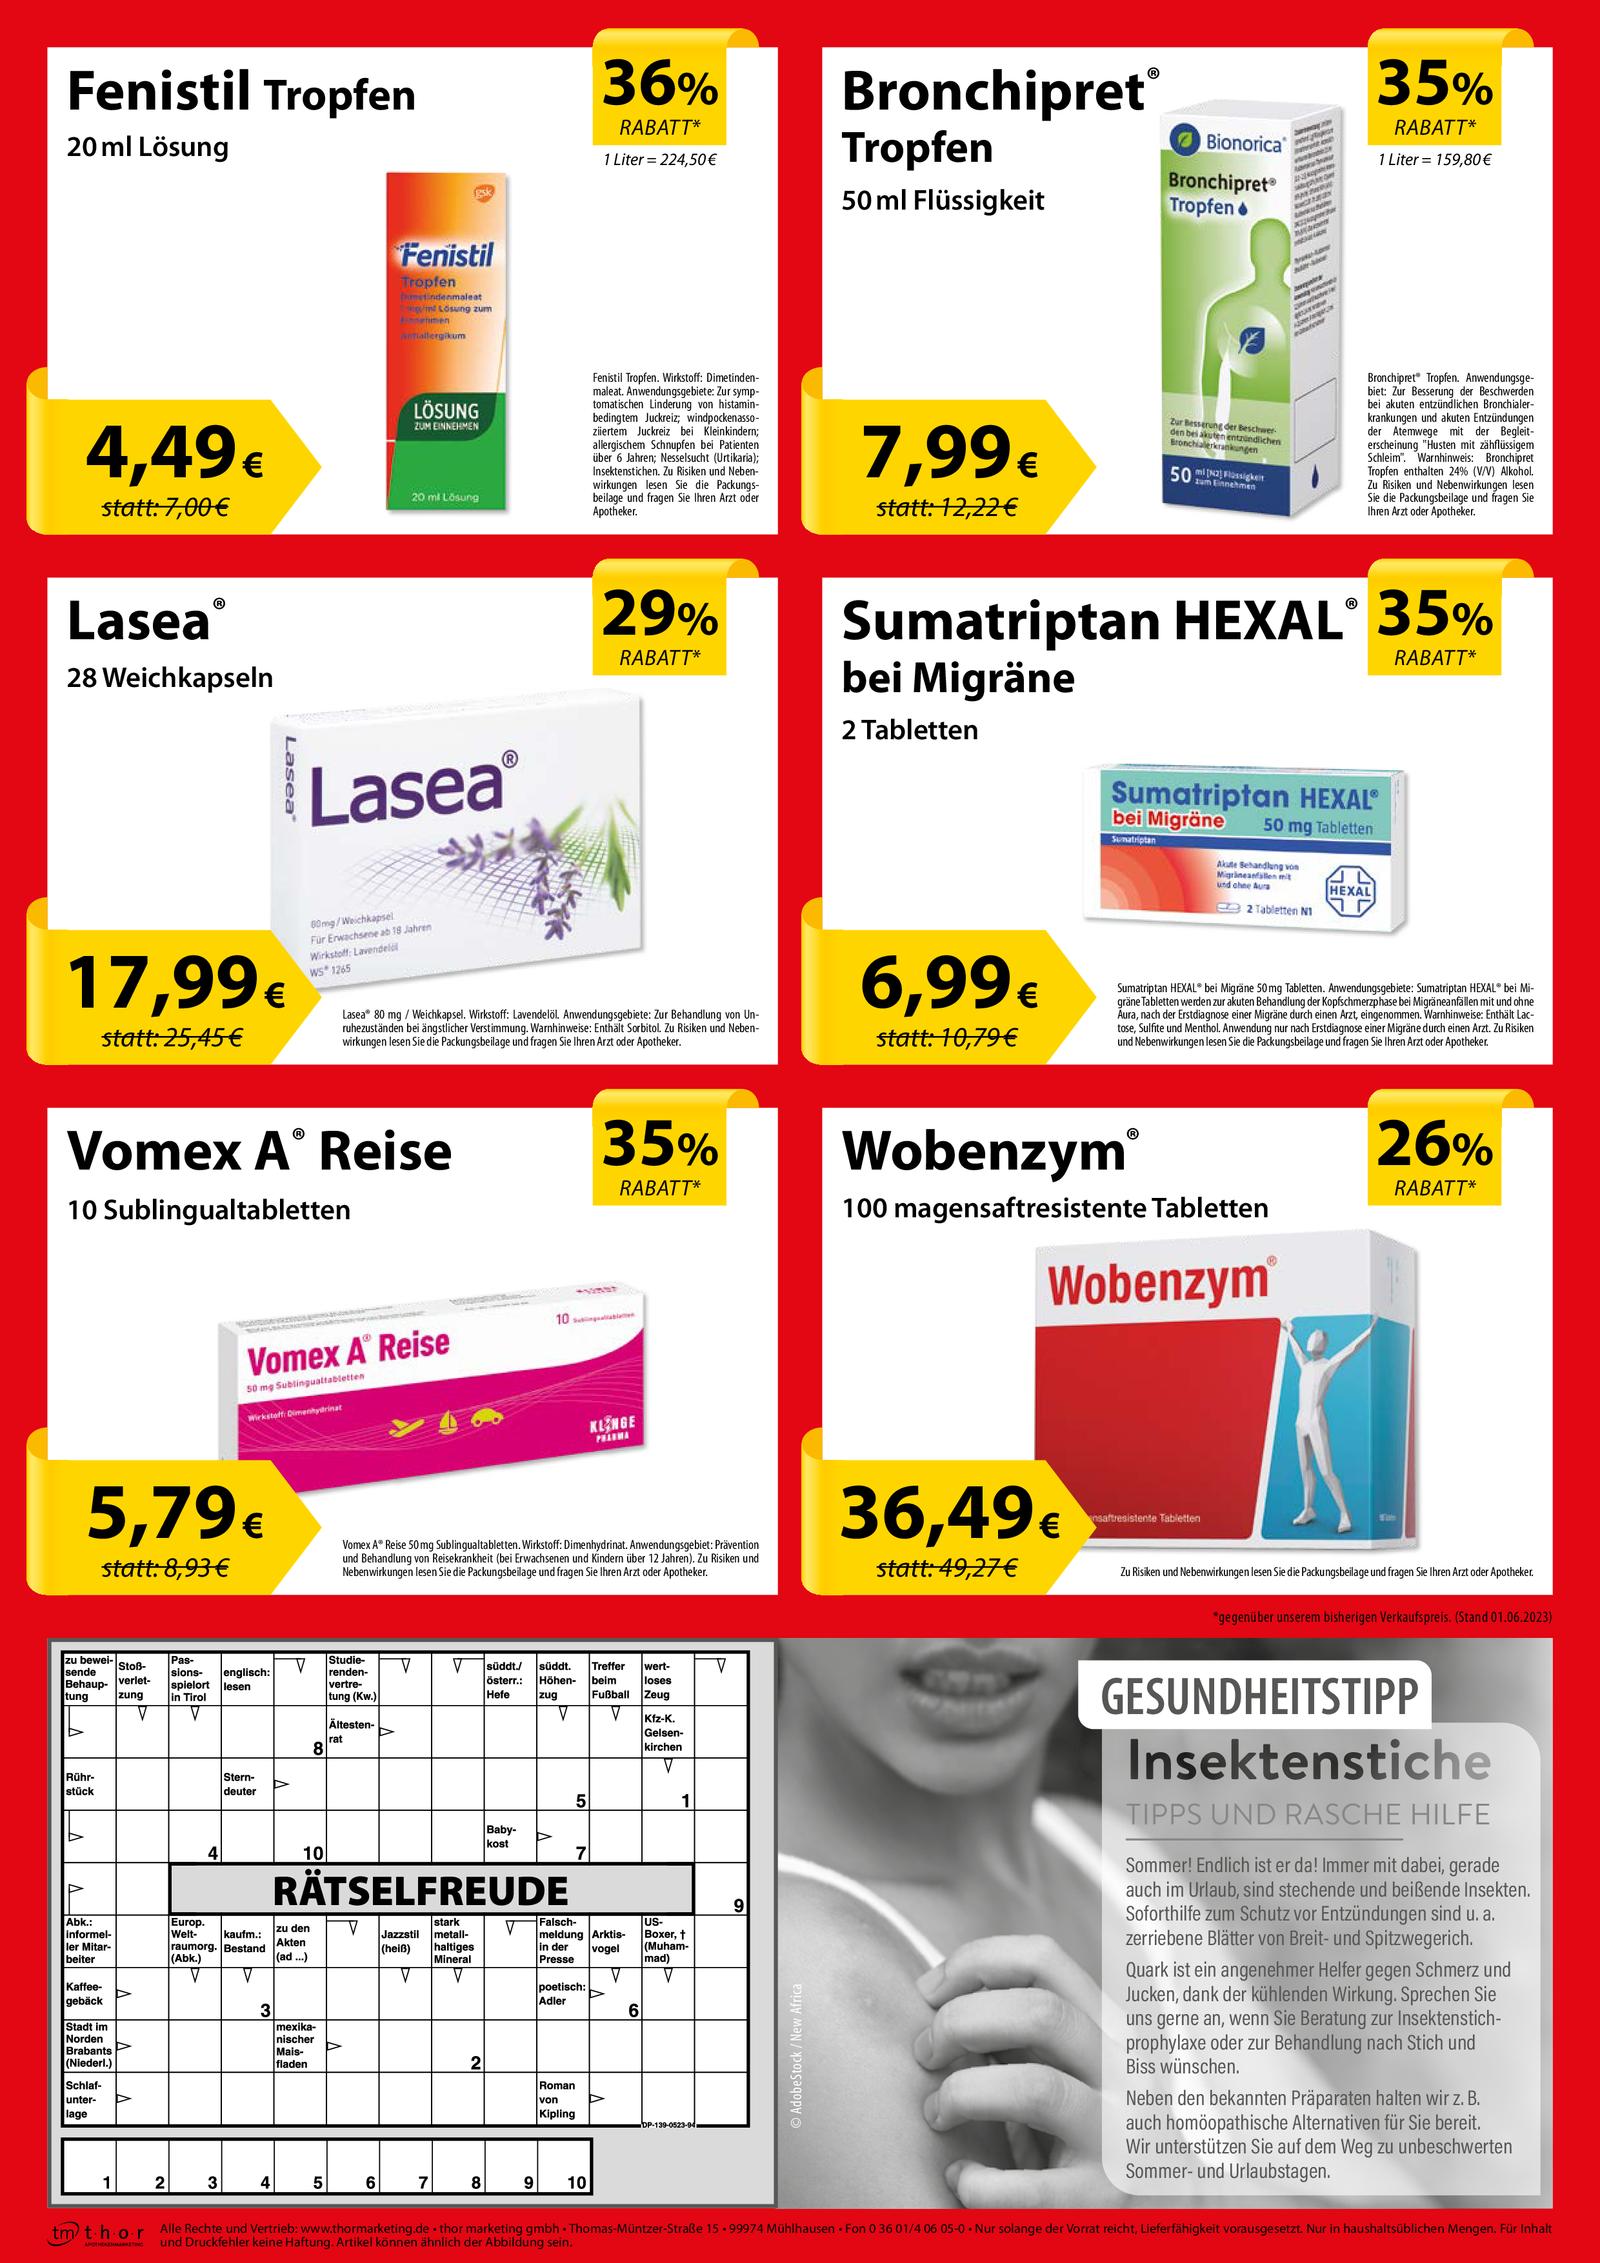 https://mein-uploads.apocdn.net/11932/leaflets/11932_flyer-Seite4.png